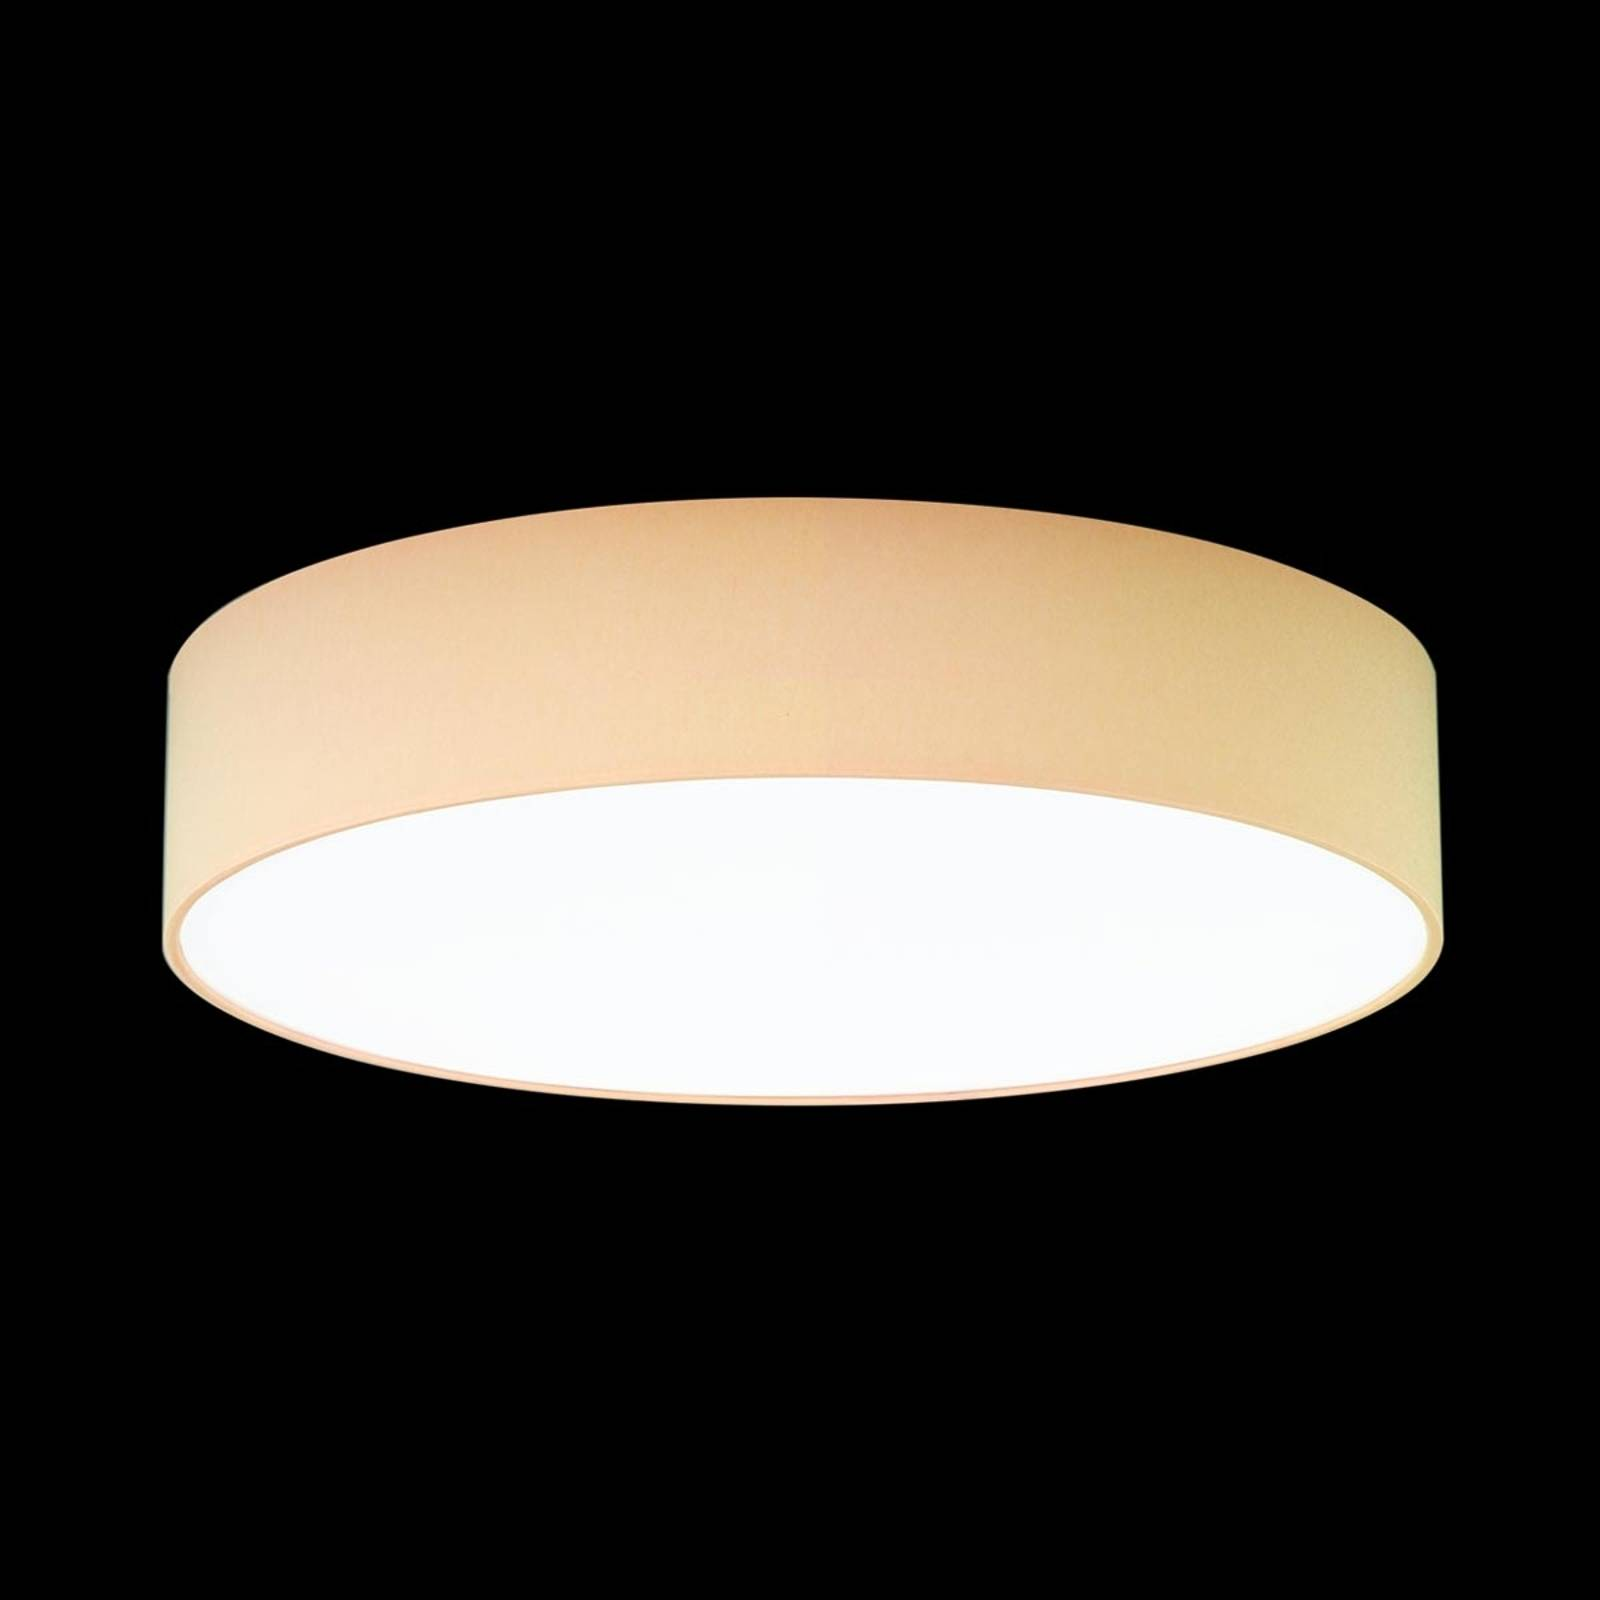 Szampańska lampa sufitowa MARA, 60 cm